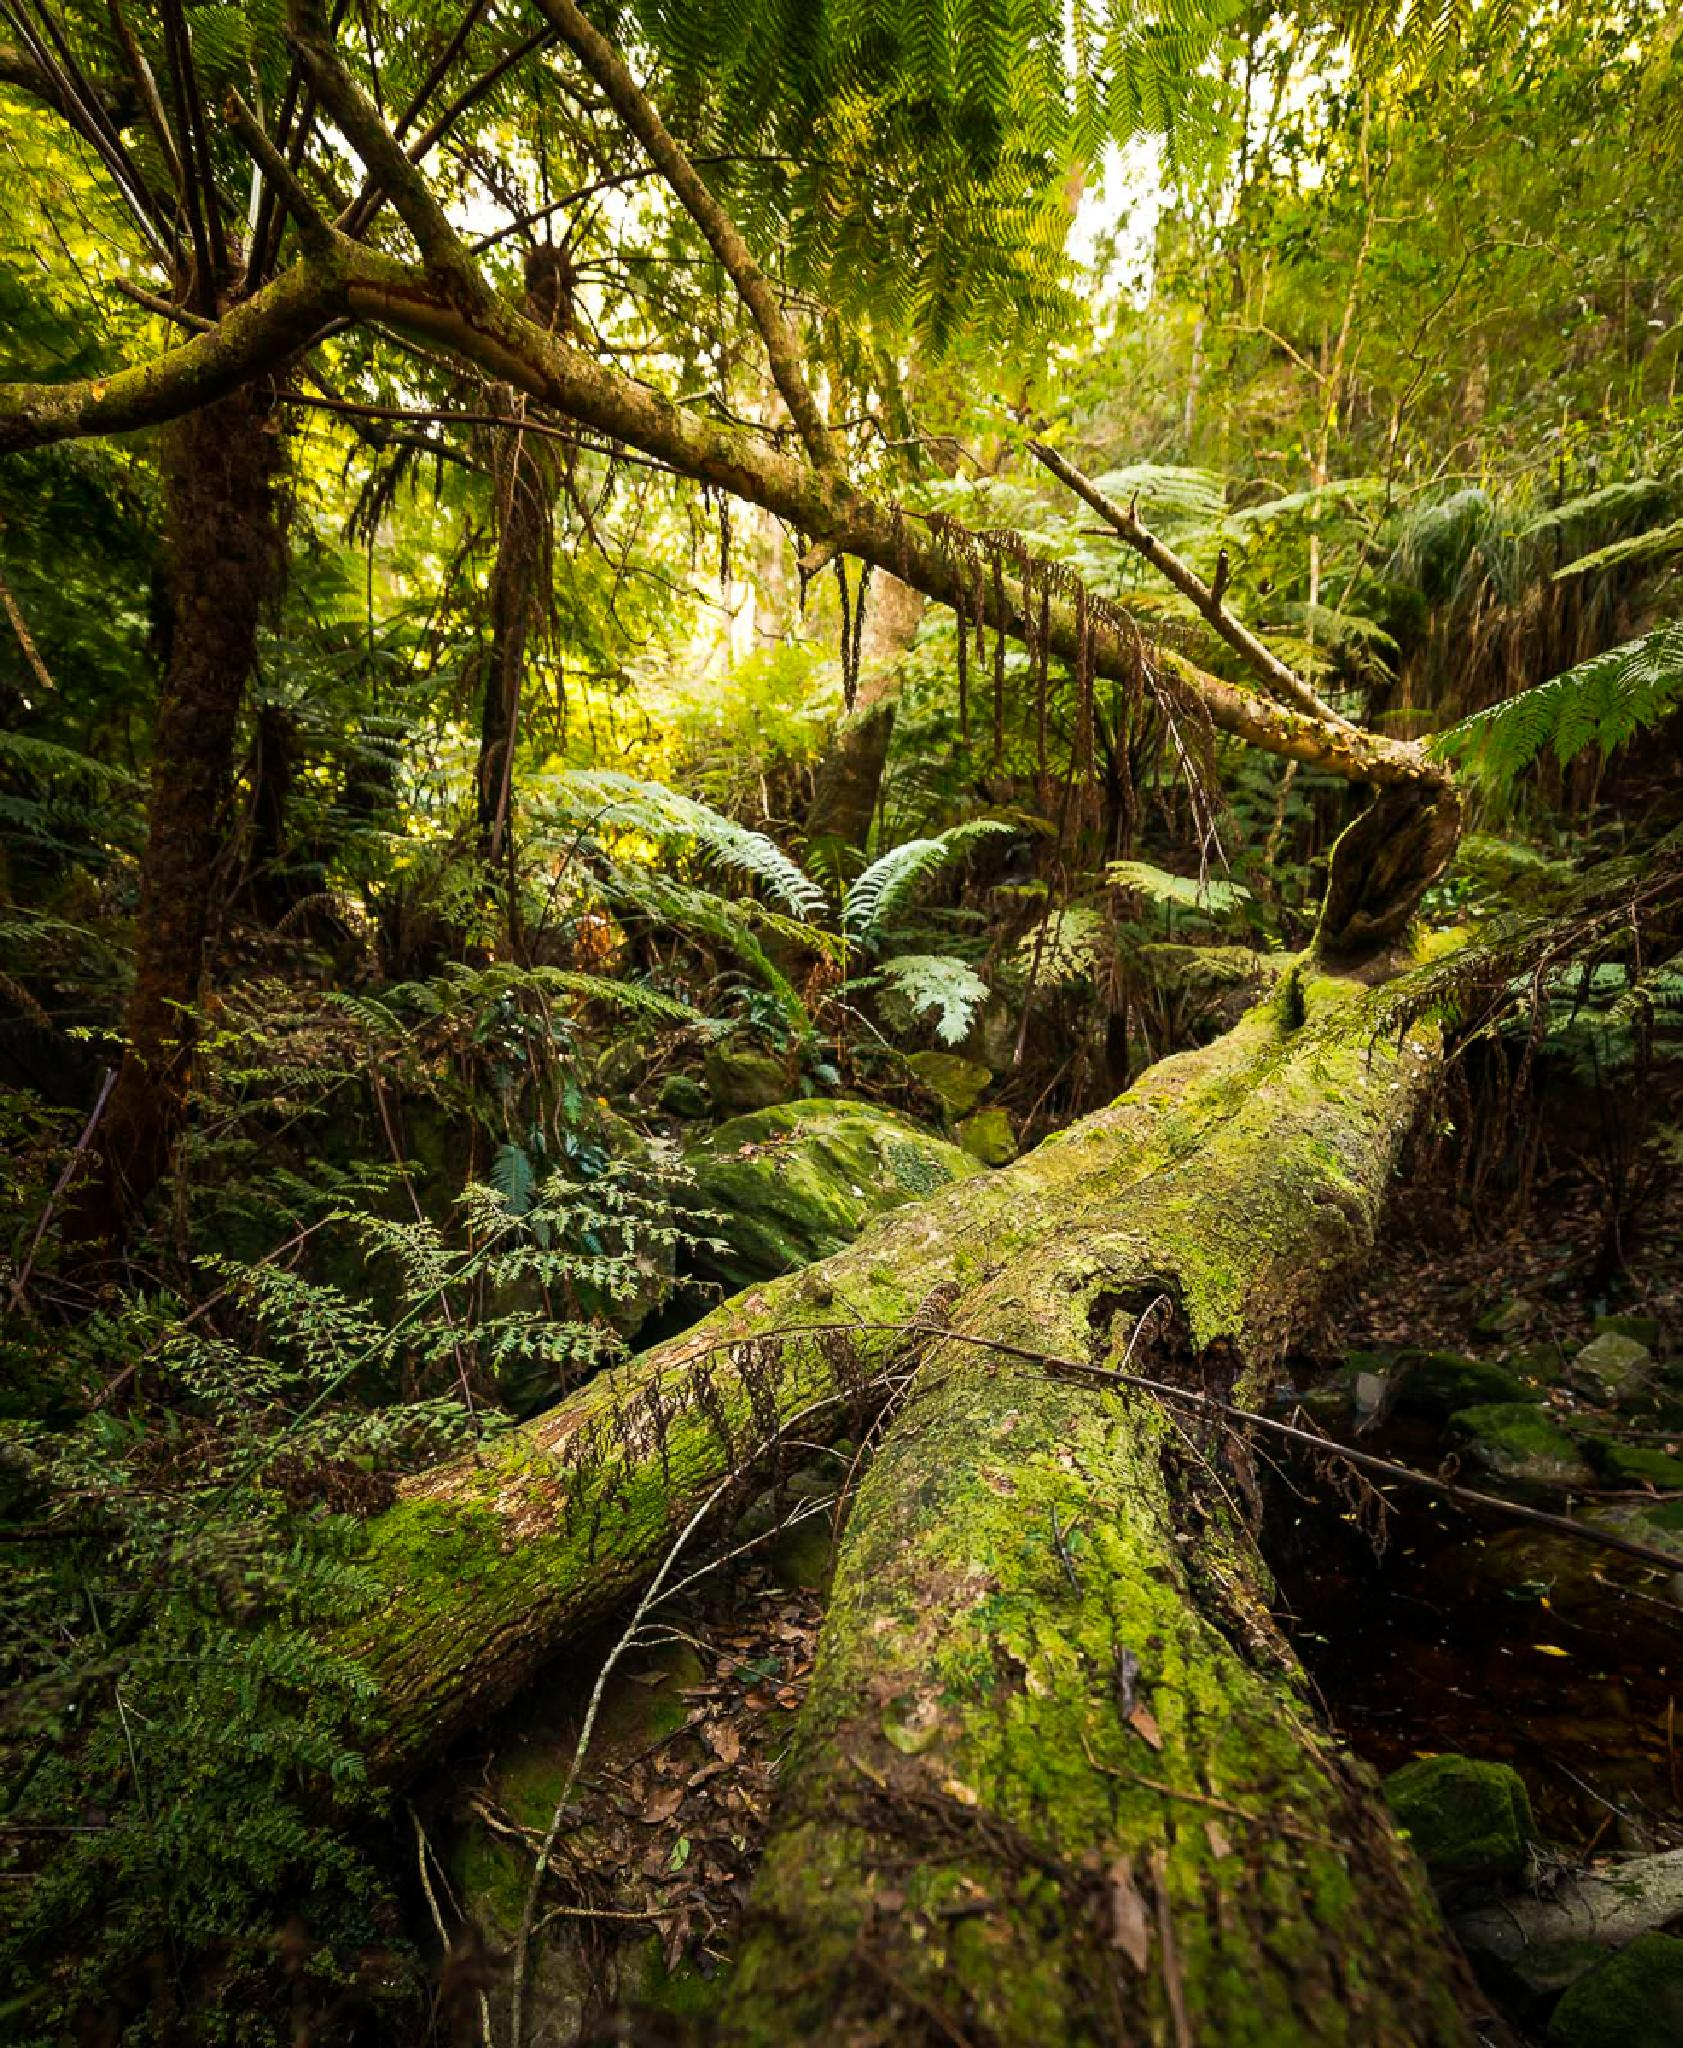 Outeniqua forest scene by Joggie van Staden